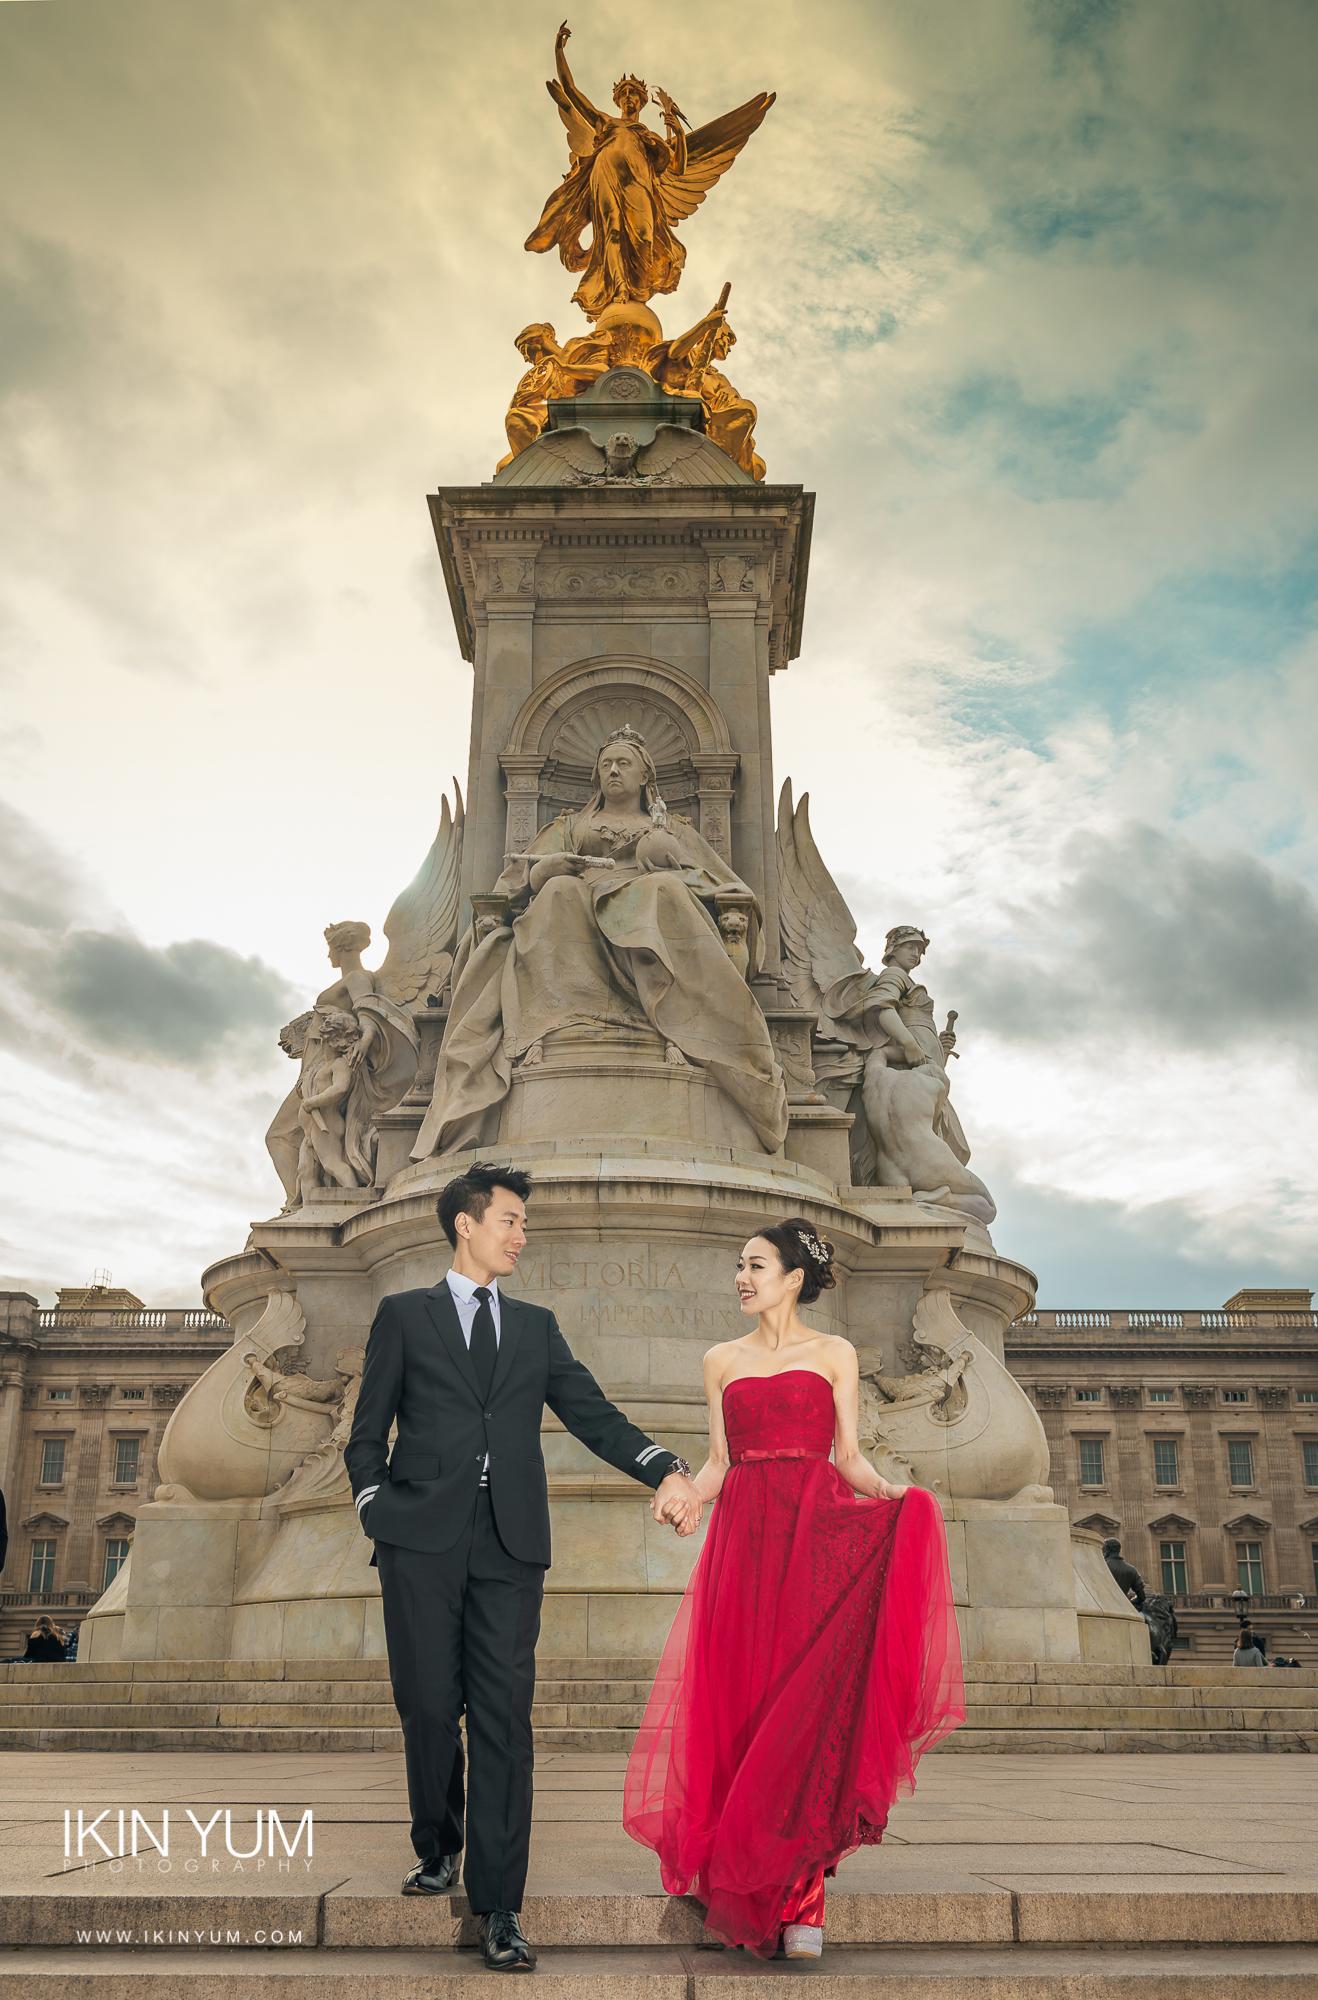 Yannis & Kenny Pre-Wedding Shoot - Ikin Yum Photography-0140.jpg